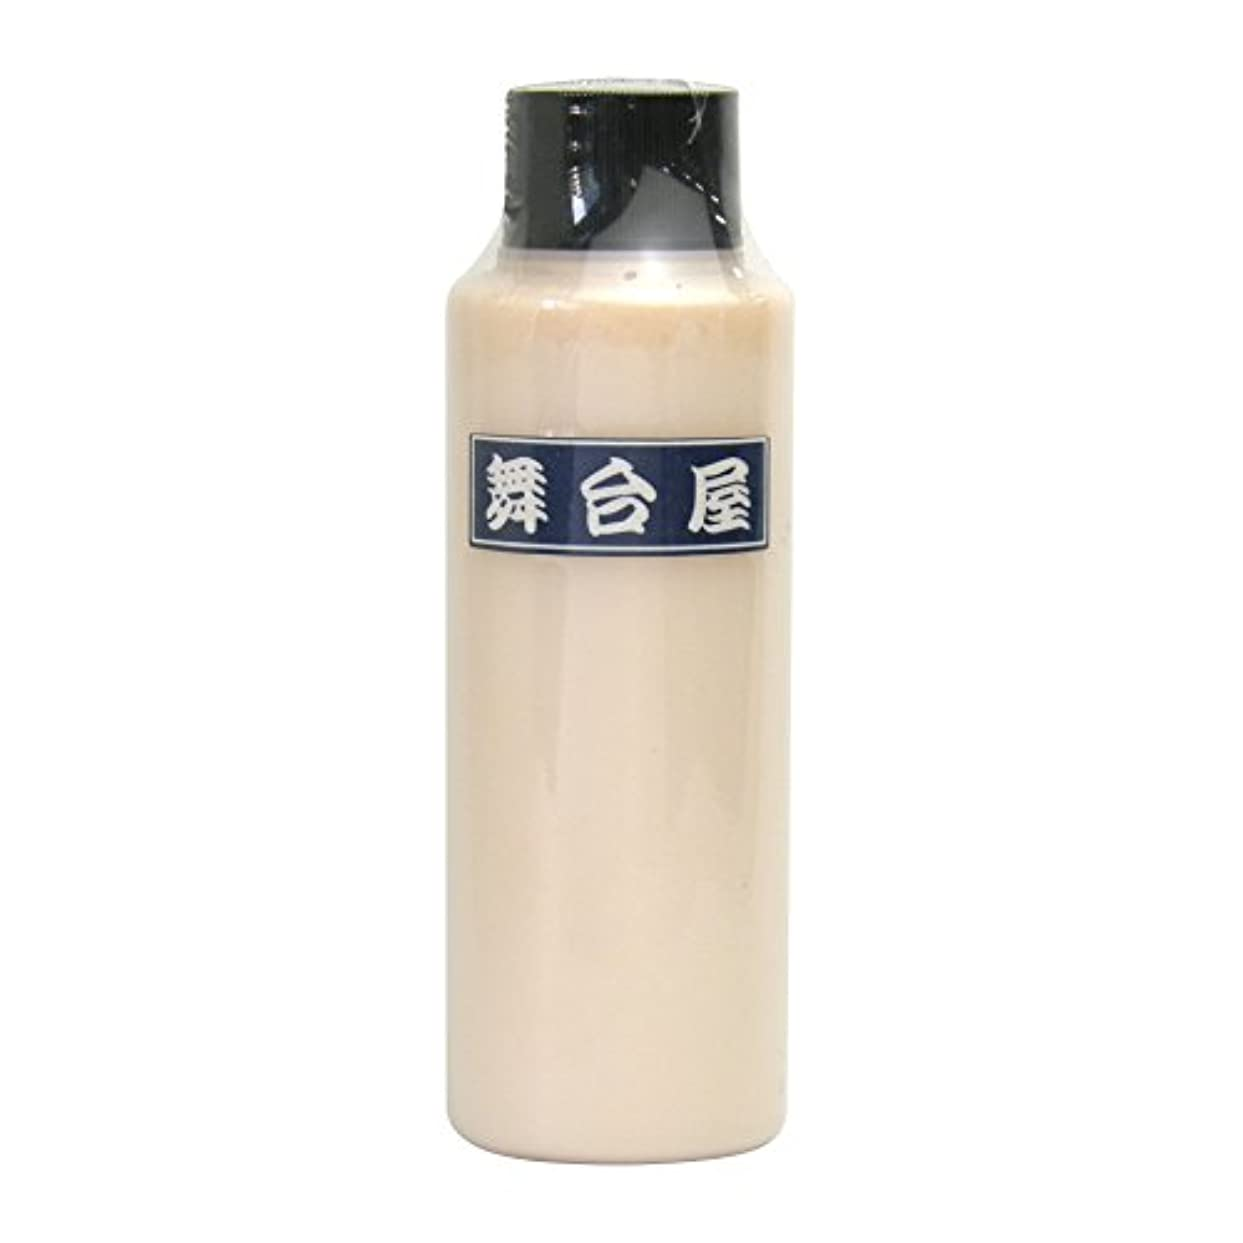 精巧な発送世界舞台屋 水白粉 ピンク-1